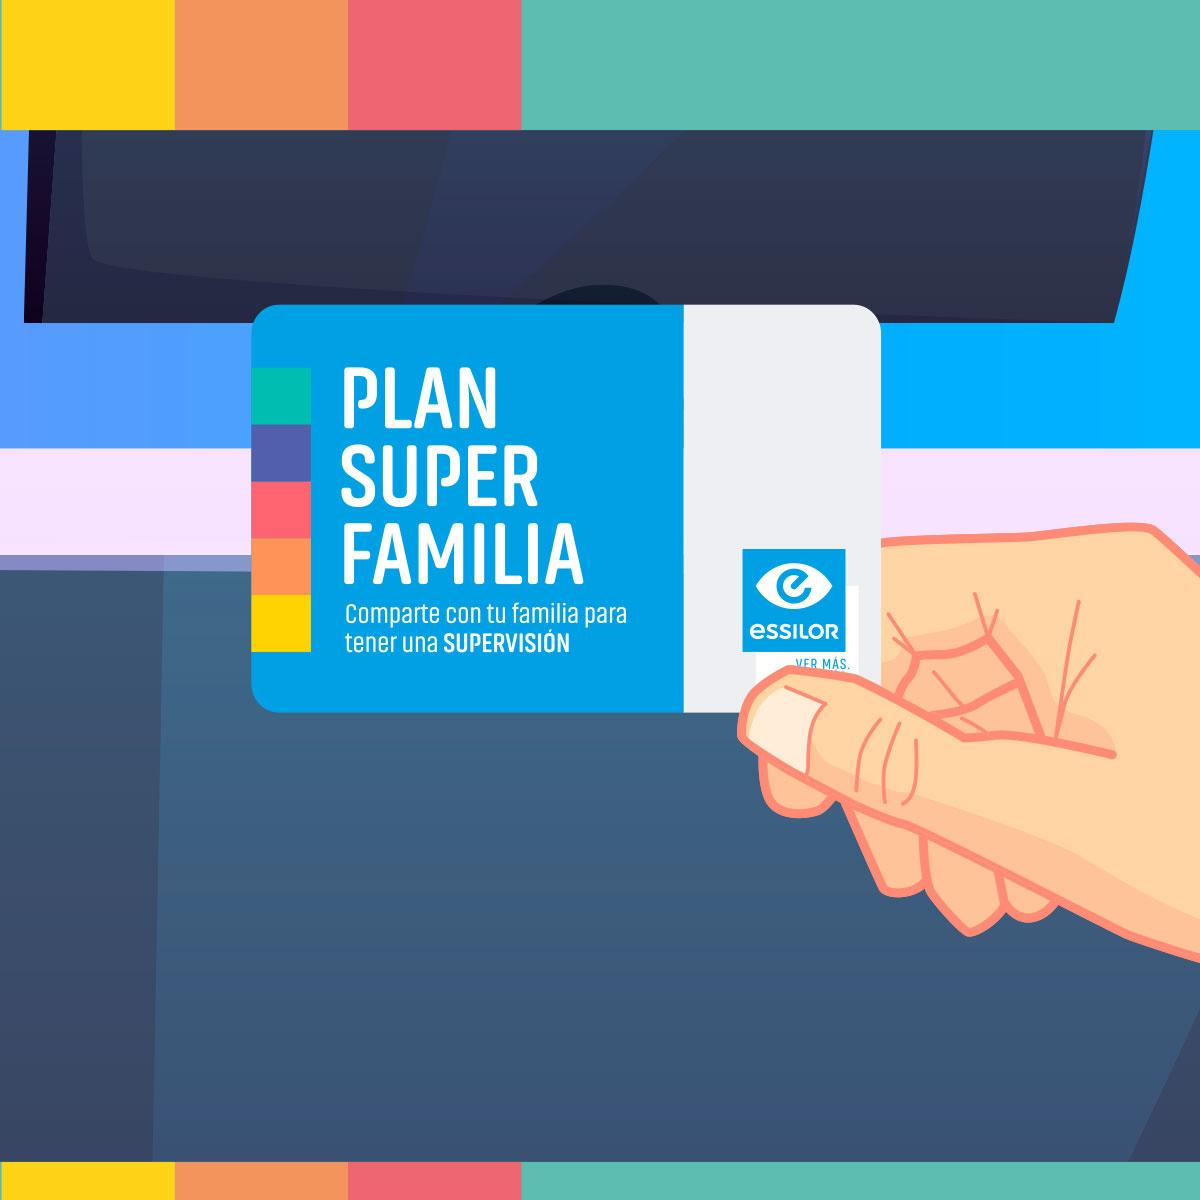 Plan Super Familias05 - PLAN SUPERFAMILIA -45% Y GRATIS